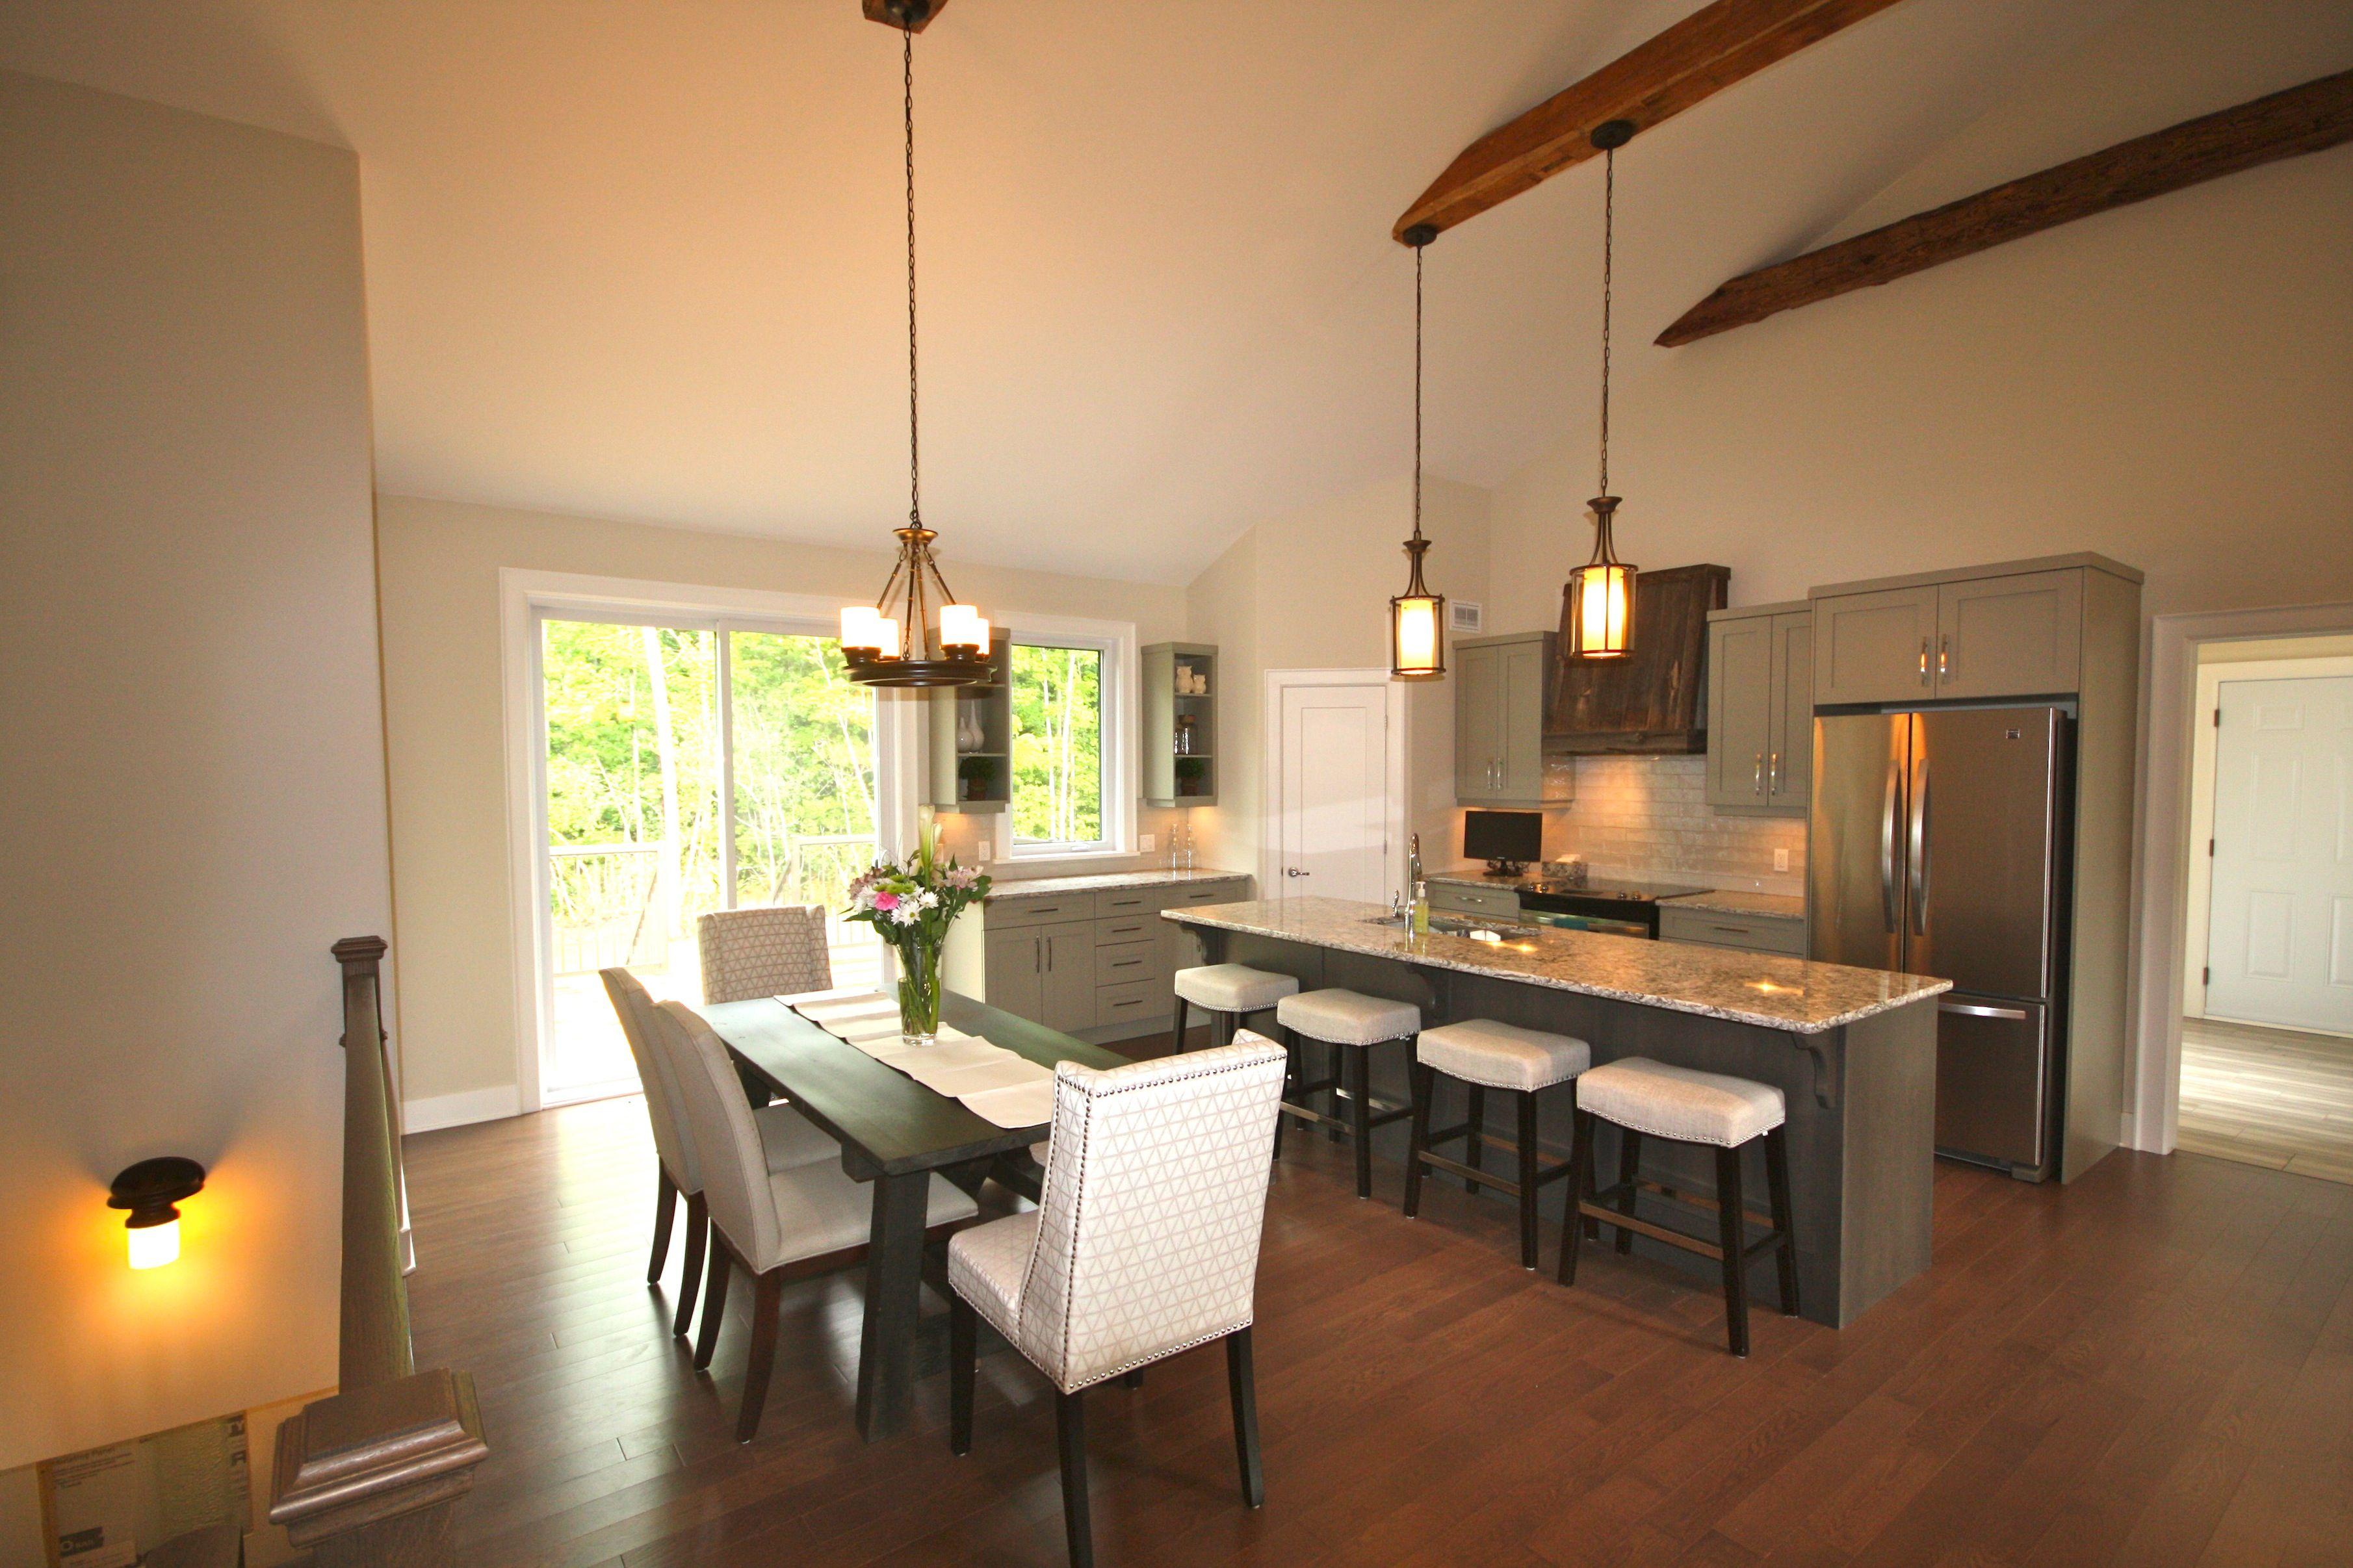 Kitchen in flint hill estates model home lockwood brothers